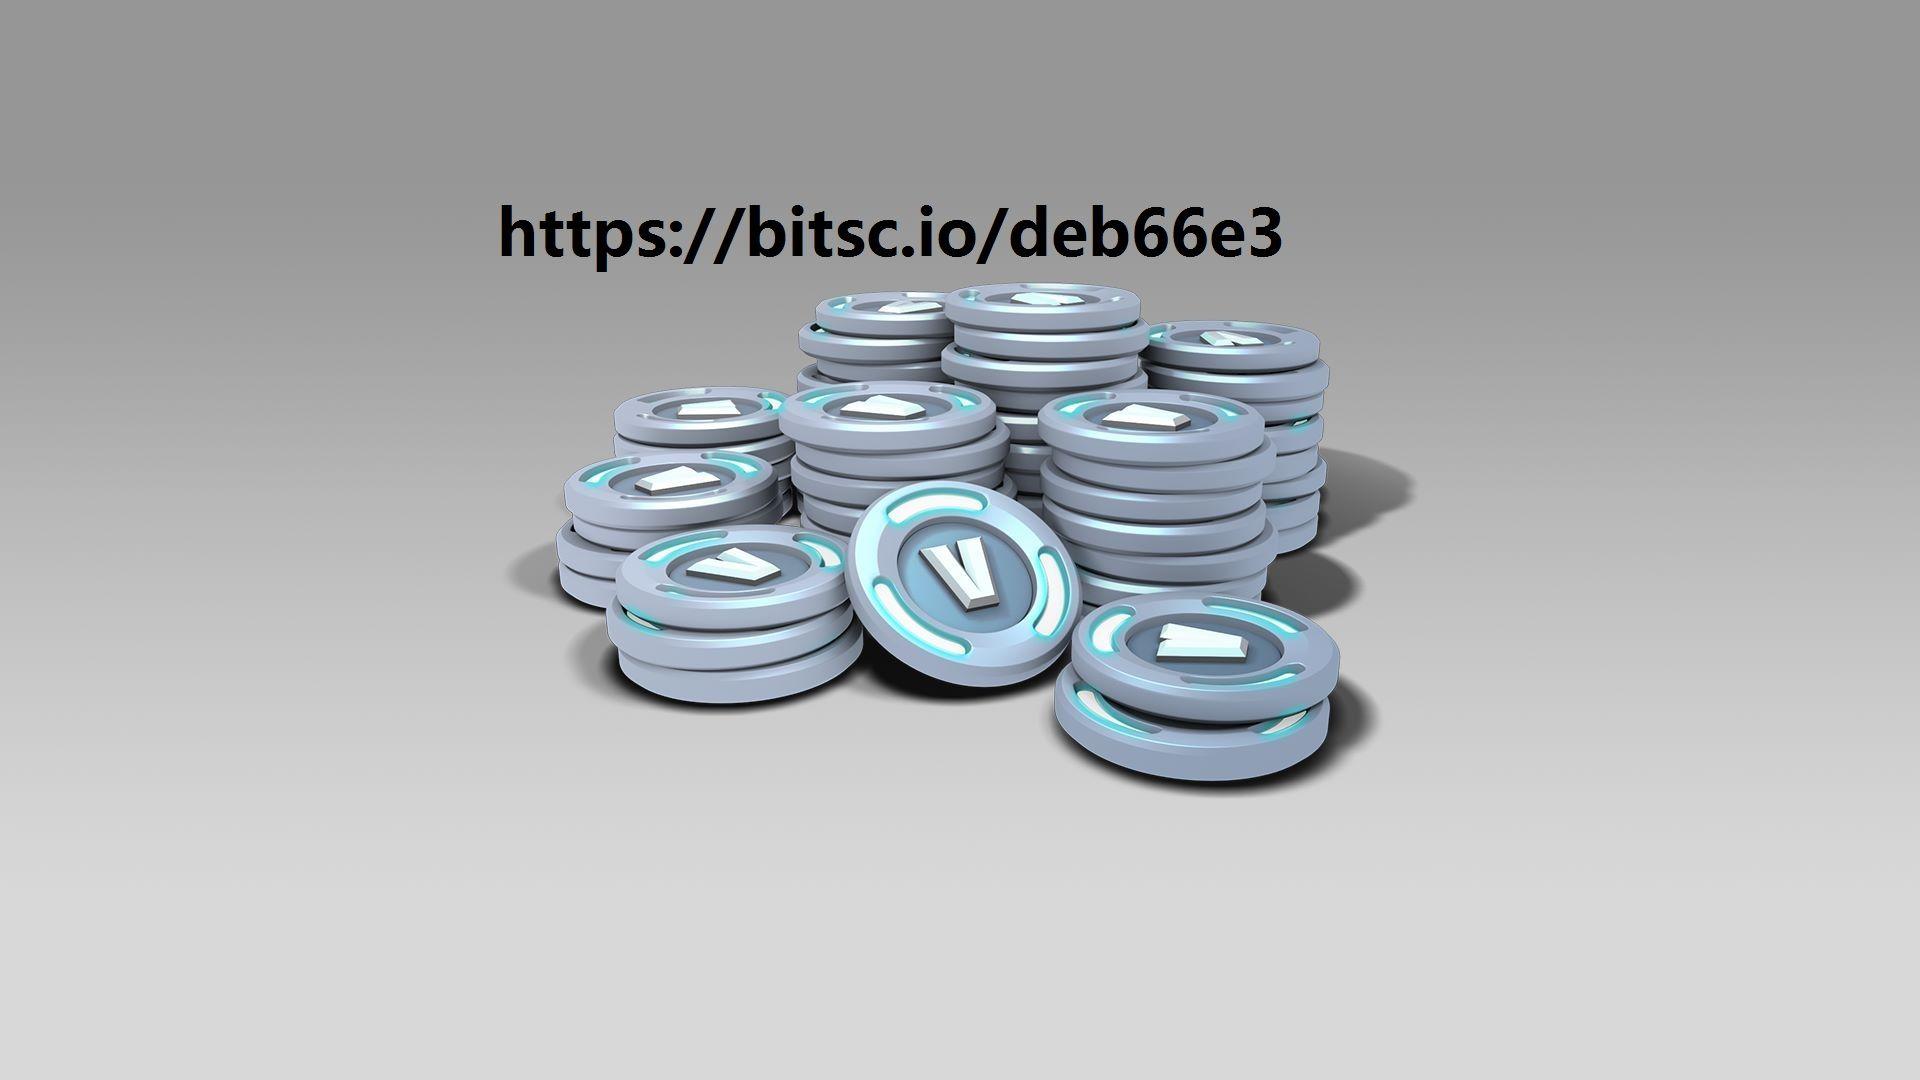 Fortnite V-Bucks Generator no verification - How to hack V ...